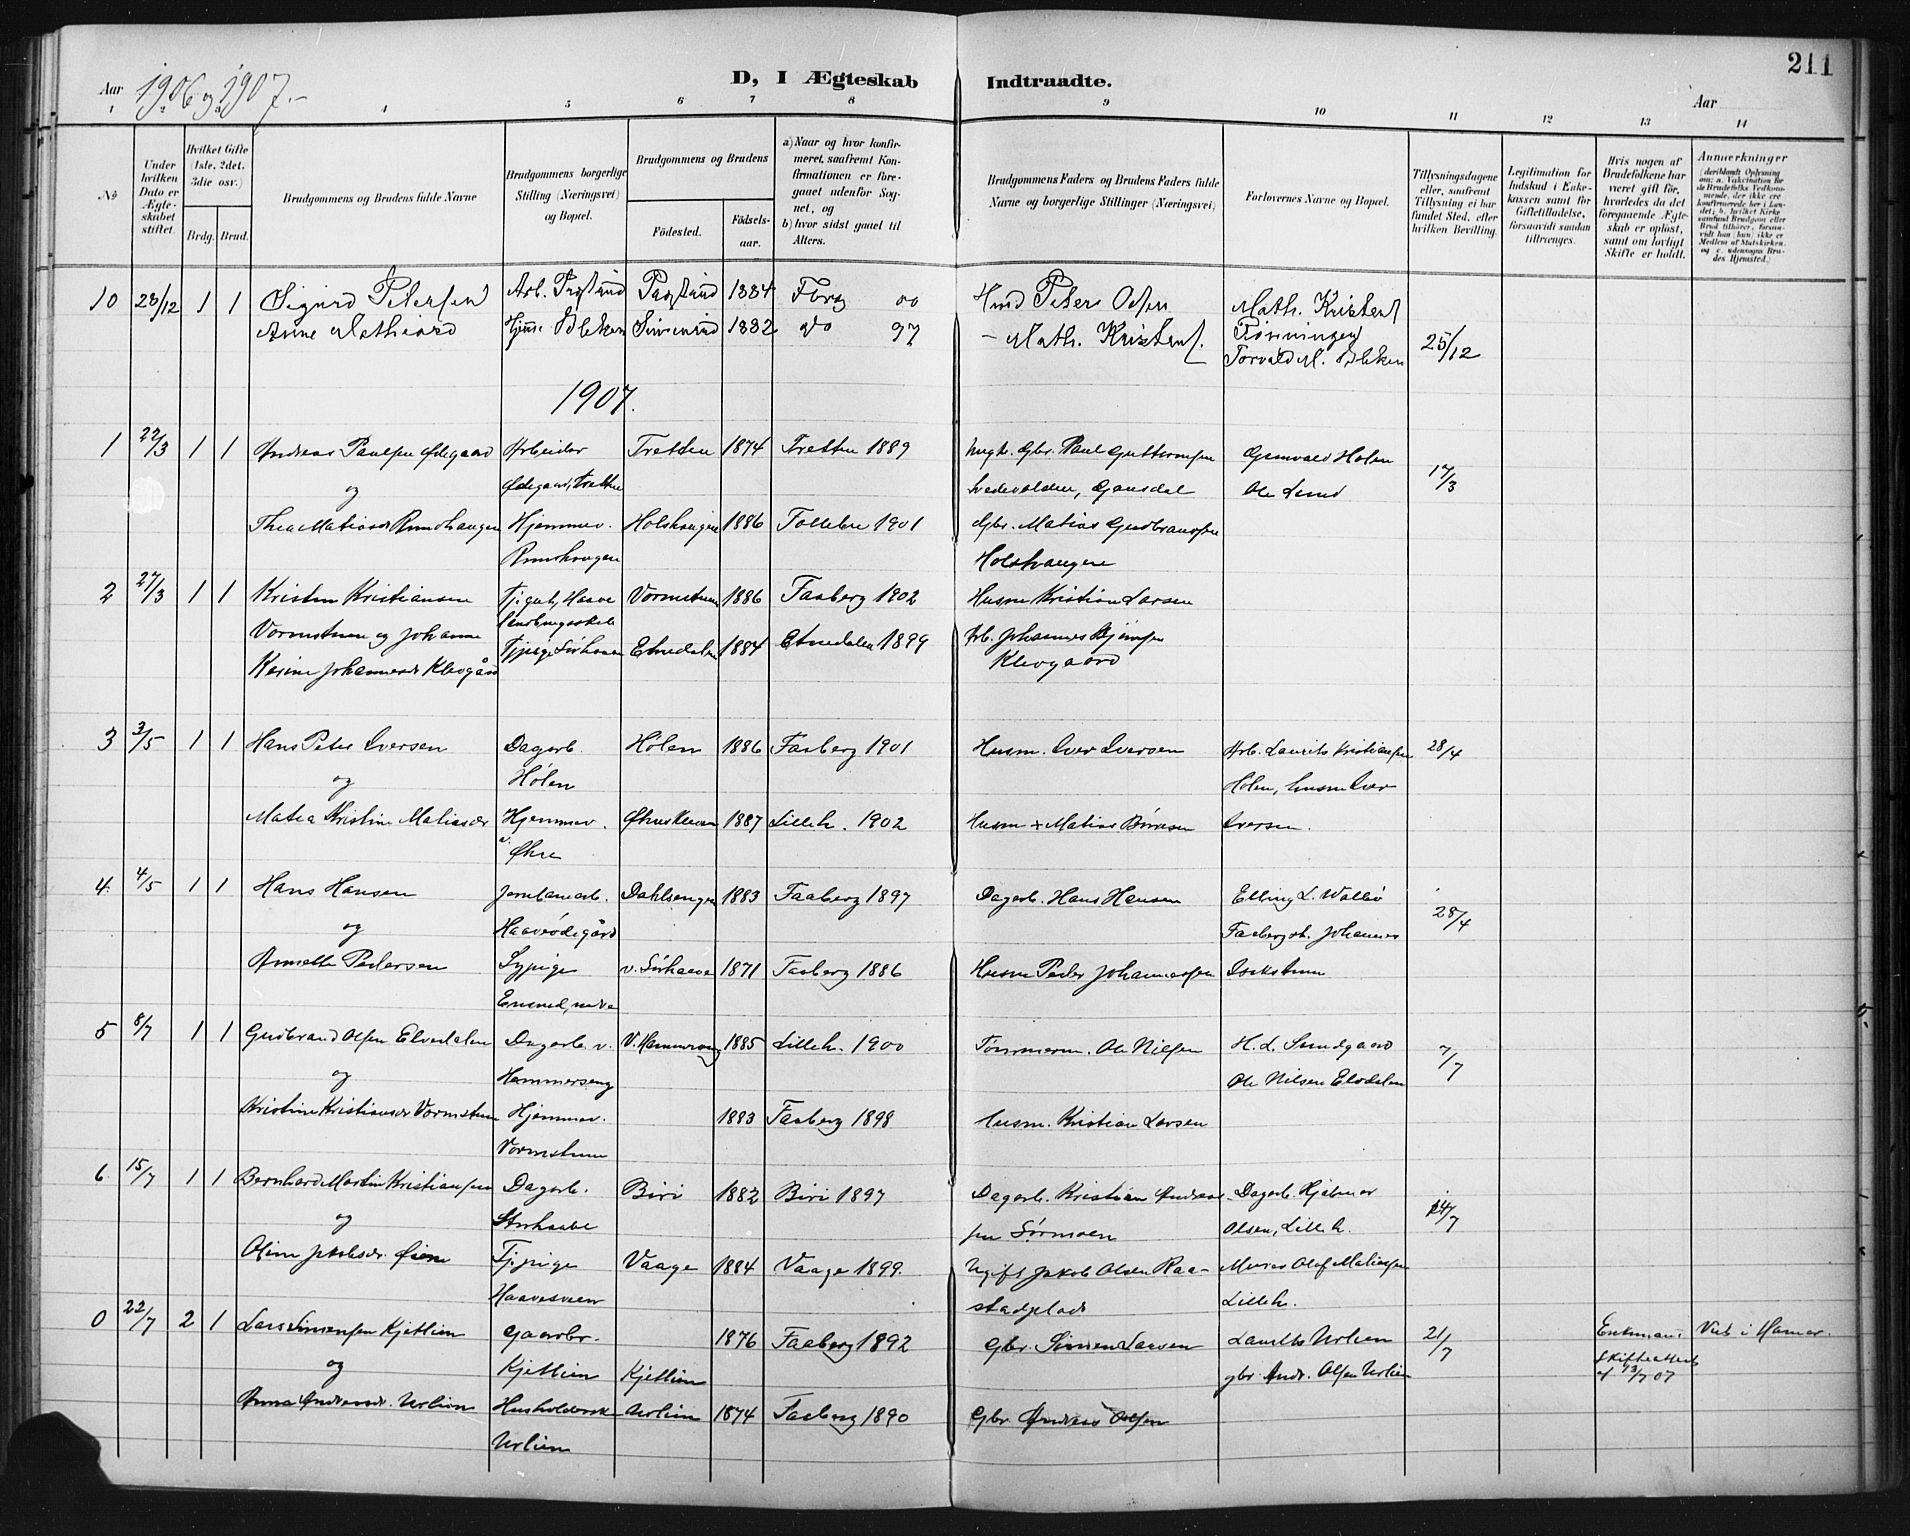 SAH, Fåberg prestekontor, Klokkerbok nr. 11, 1901-1921, s. 211